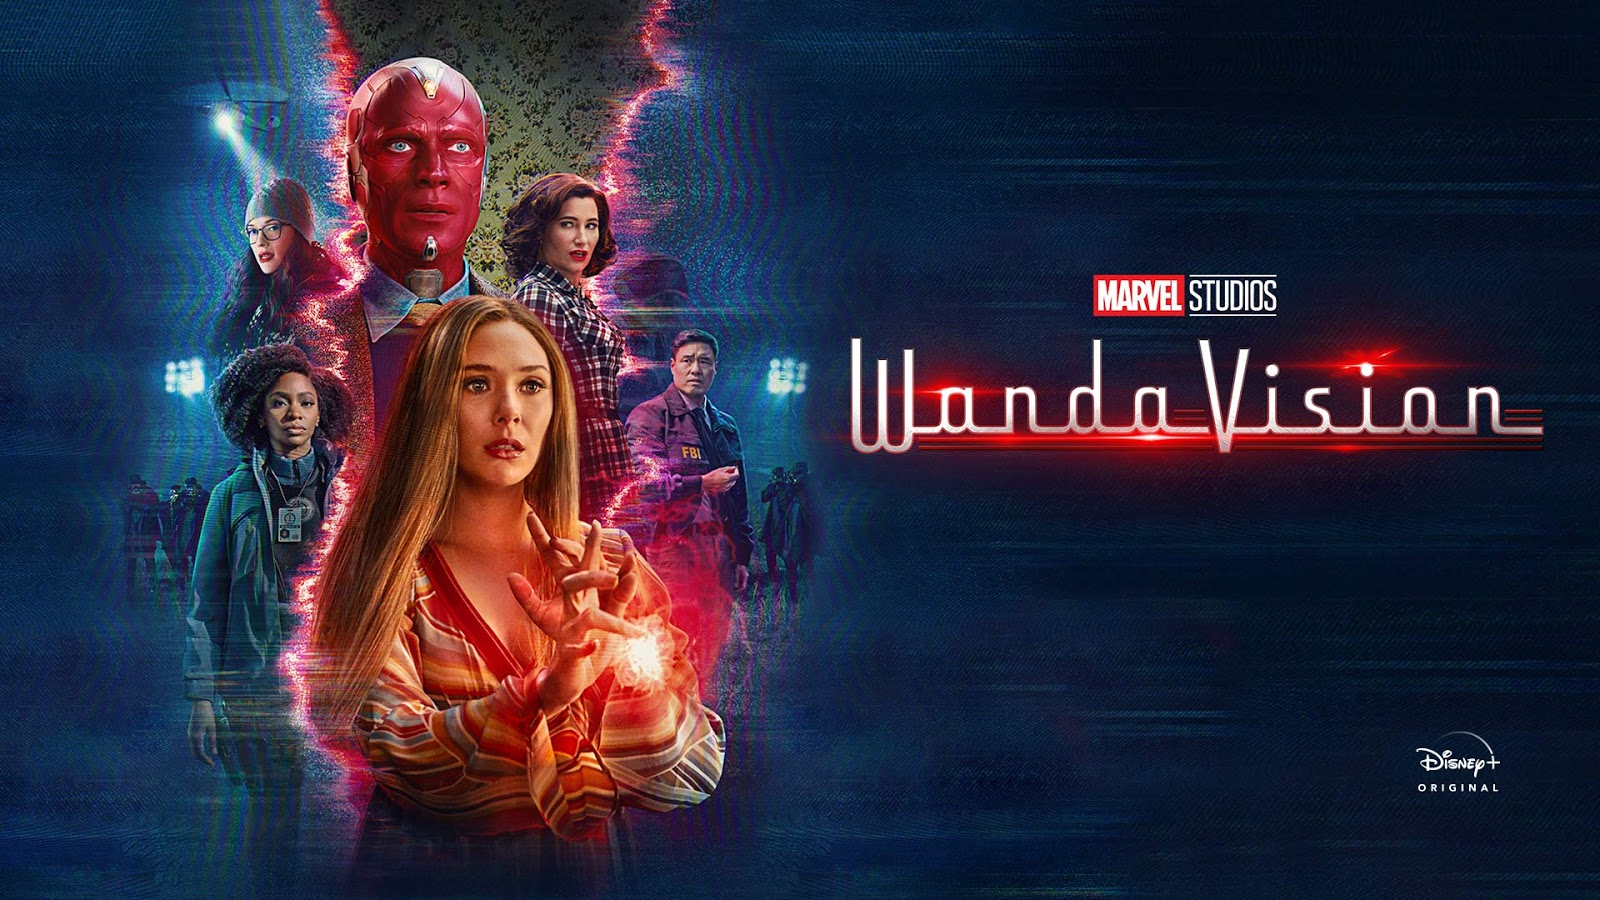 WandaVision (2021) English Disney+ Series Download 1080p WEB-DL